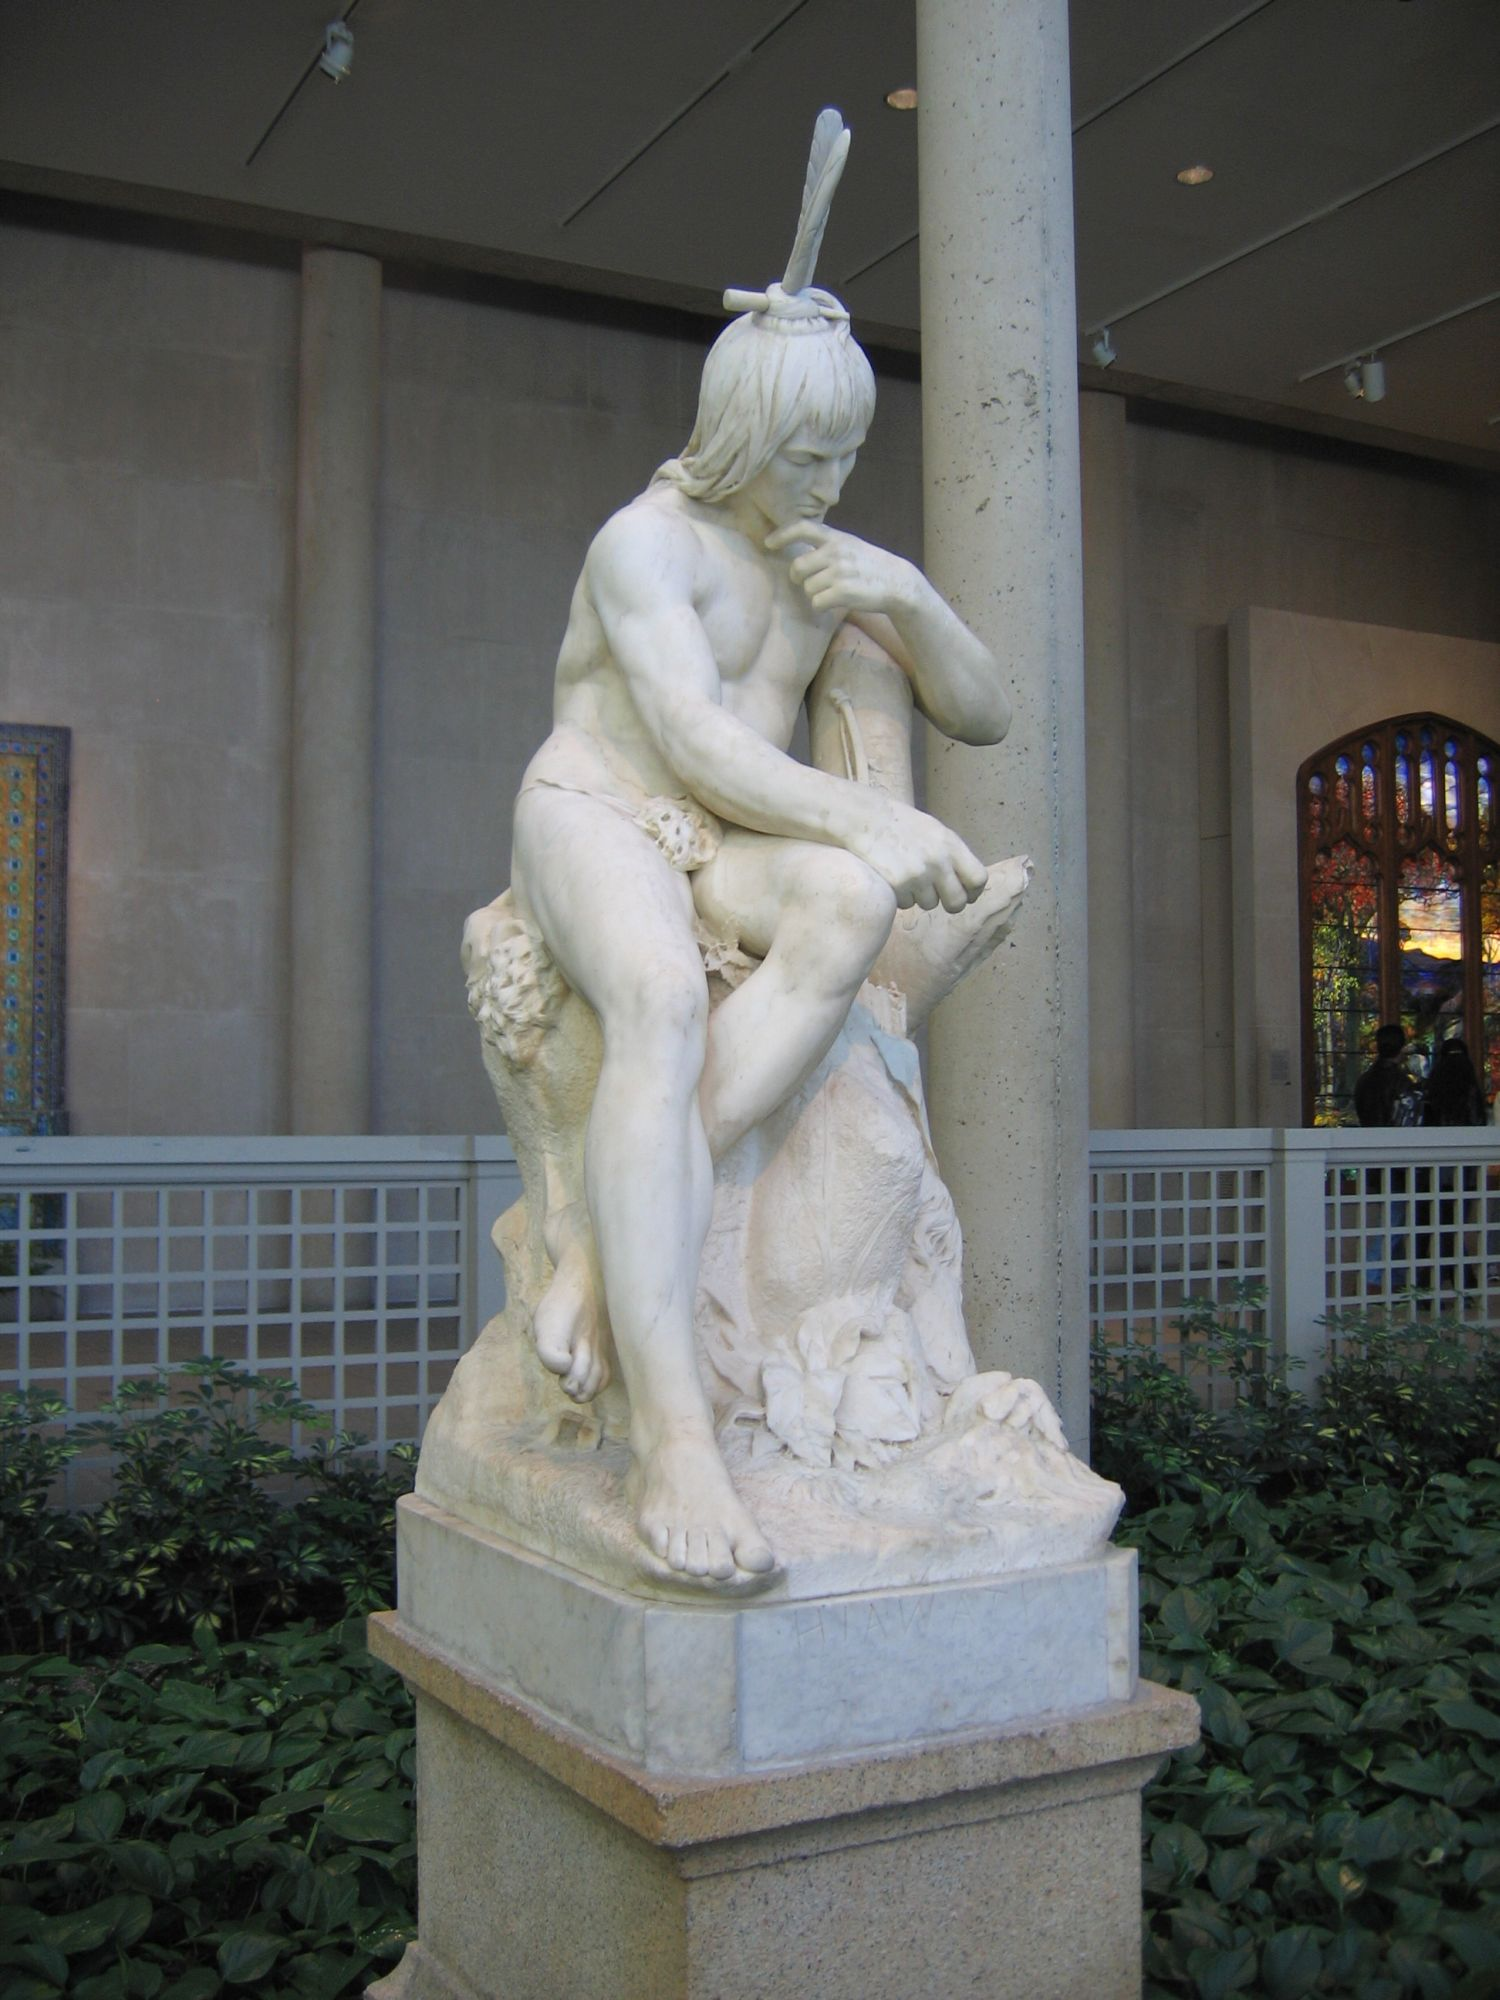 Saint-Gaudens, Augustus